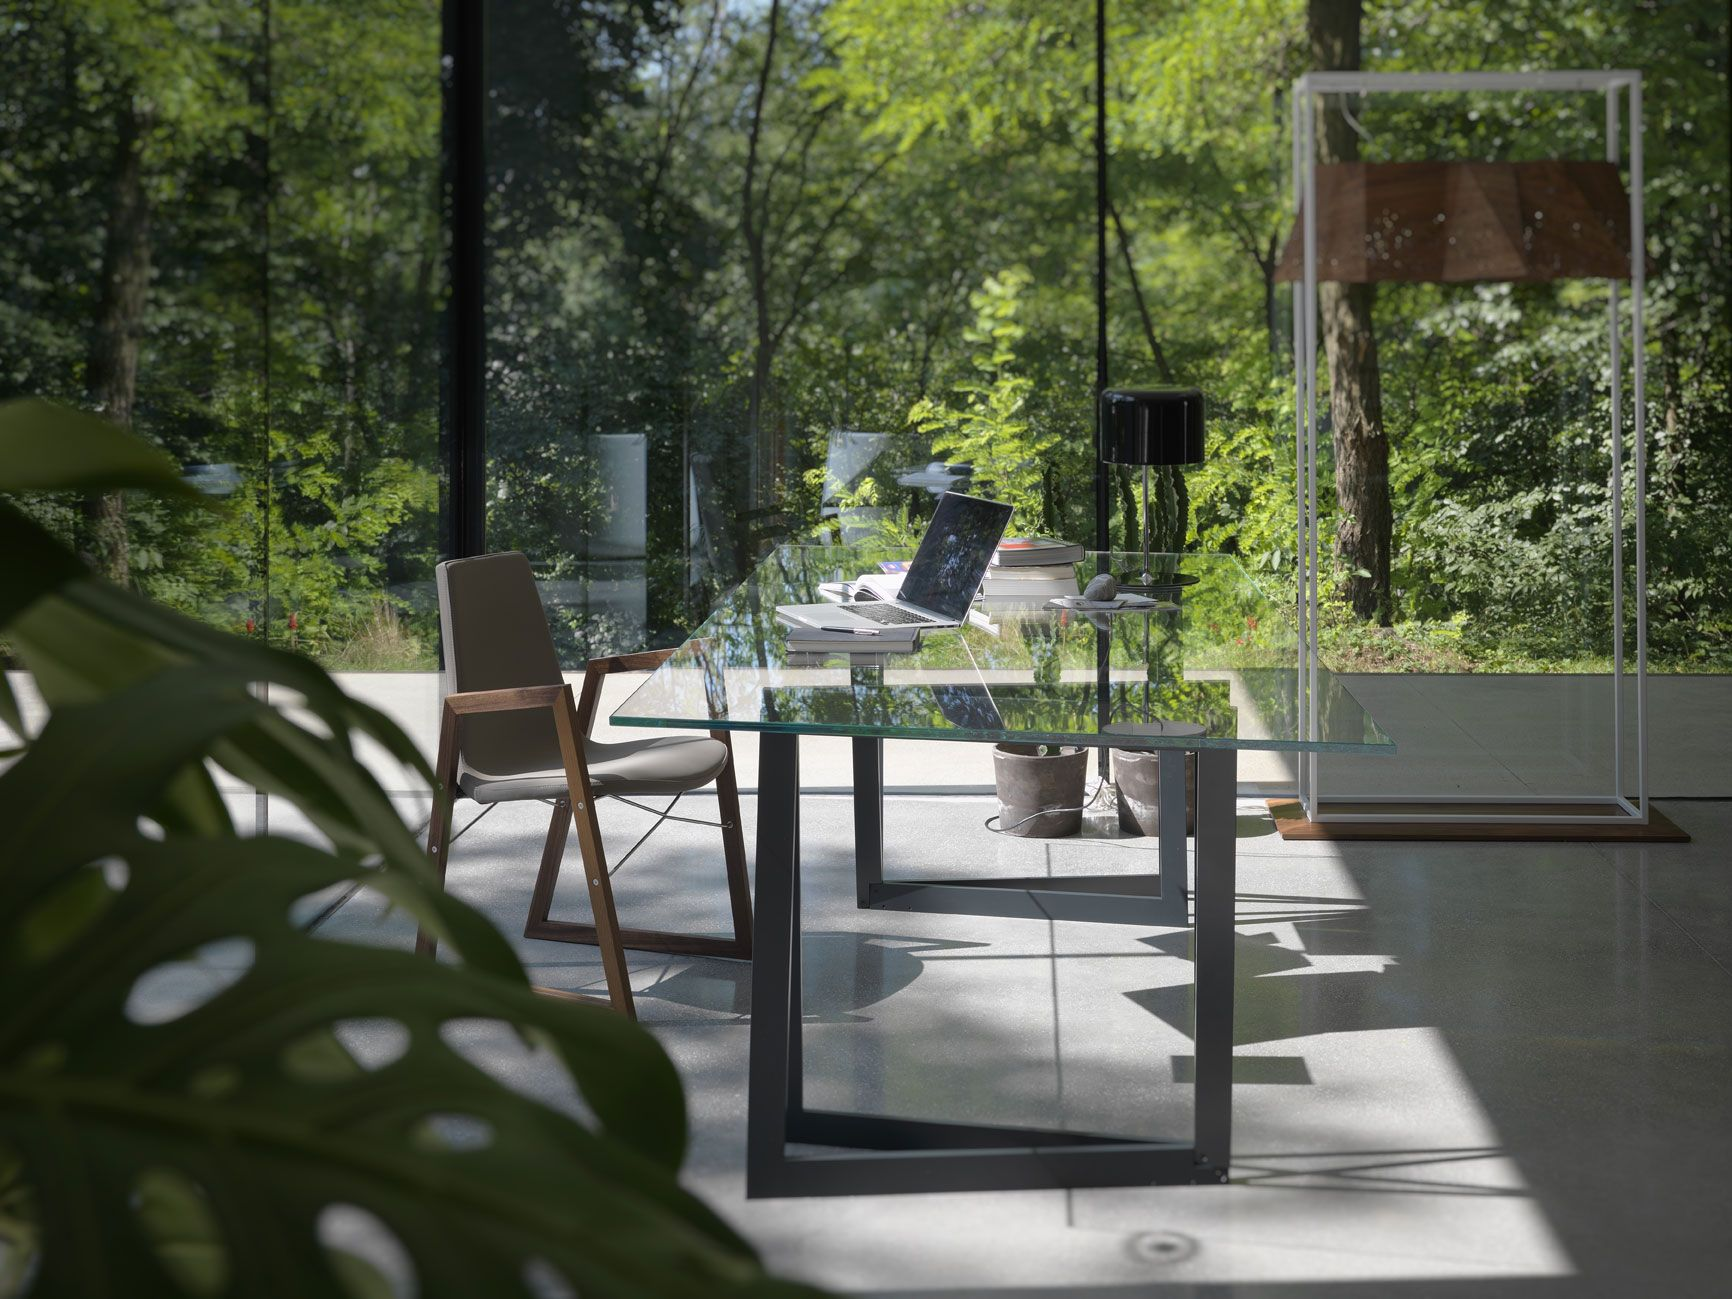 QUADROR 02 / Design: Dror, 2015 /\/\/\ RAY ARMCHAIR / design: Orlandini Design /\/\/\ RIDDLED LIGHT / Design: Steven Holl, Mario Bellini